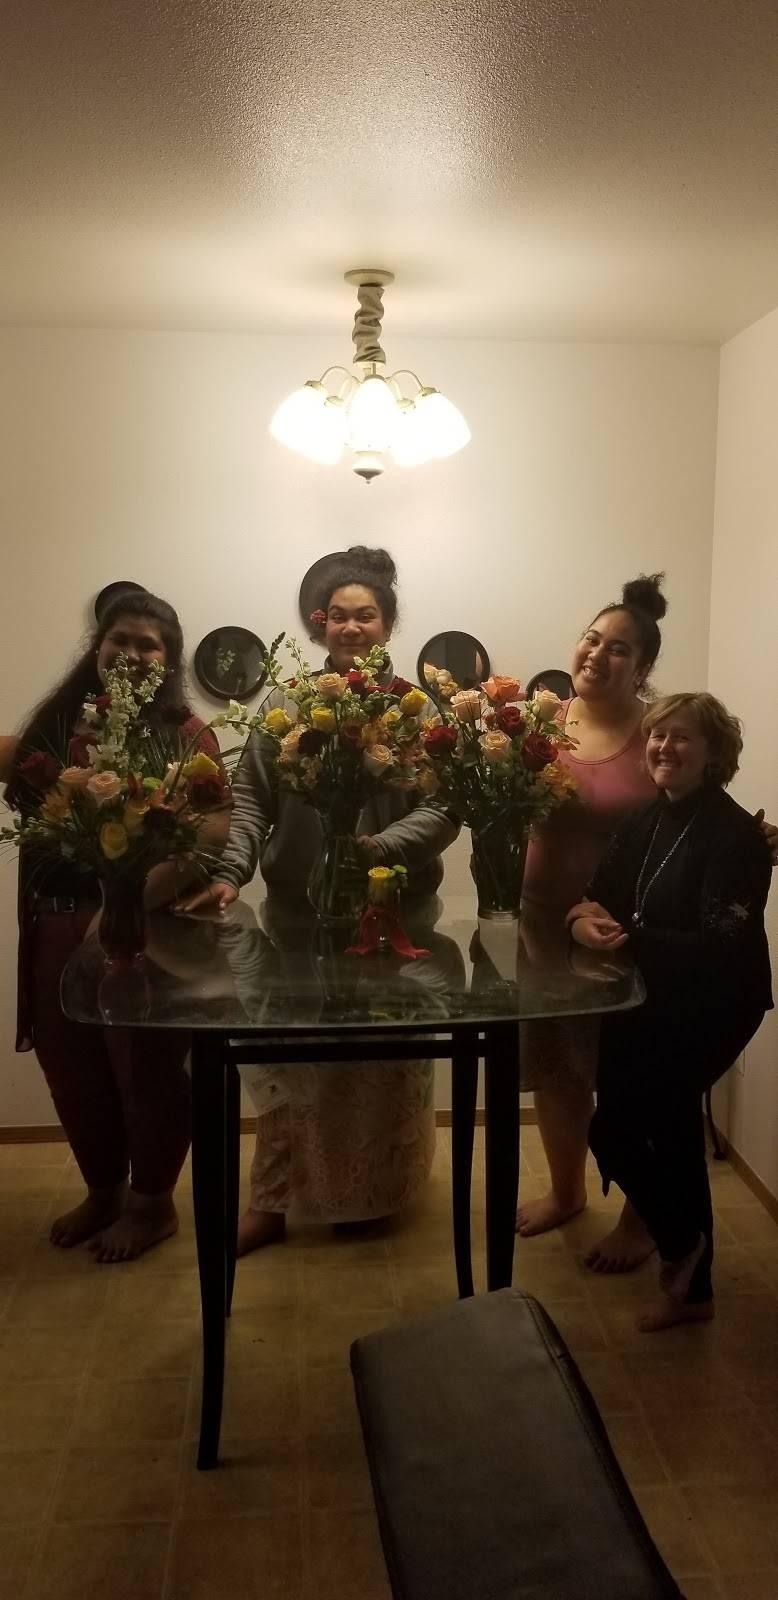 Red Carpet Flower Boutique - florist  | Photo 1 of 8 | Address: 12611 Landmark Ct unit b, Anchorage, AK 99515, USA | Phone: (907) 350-9792